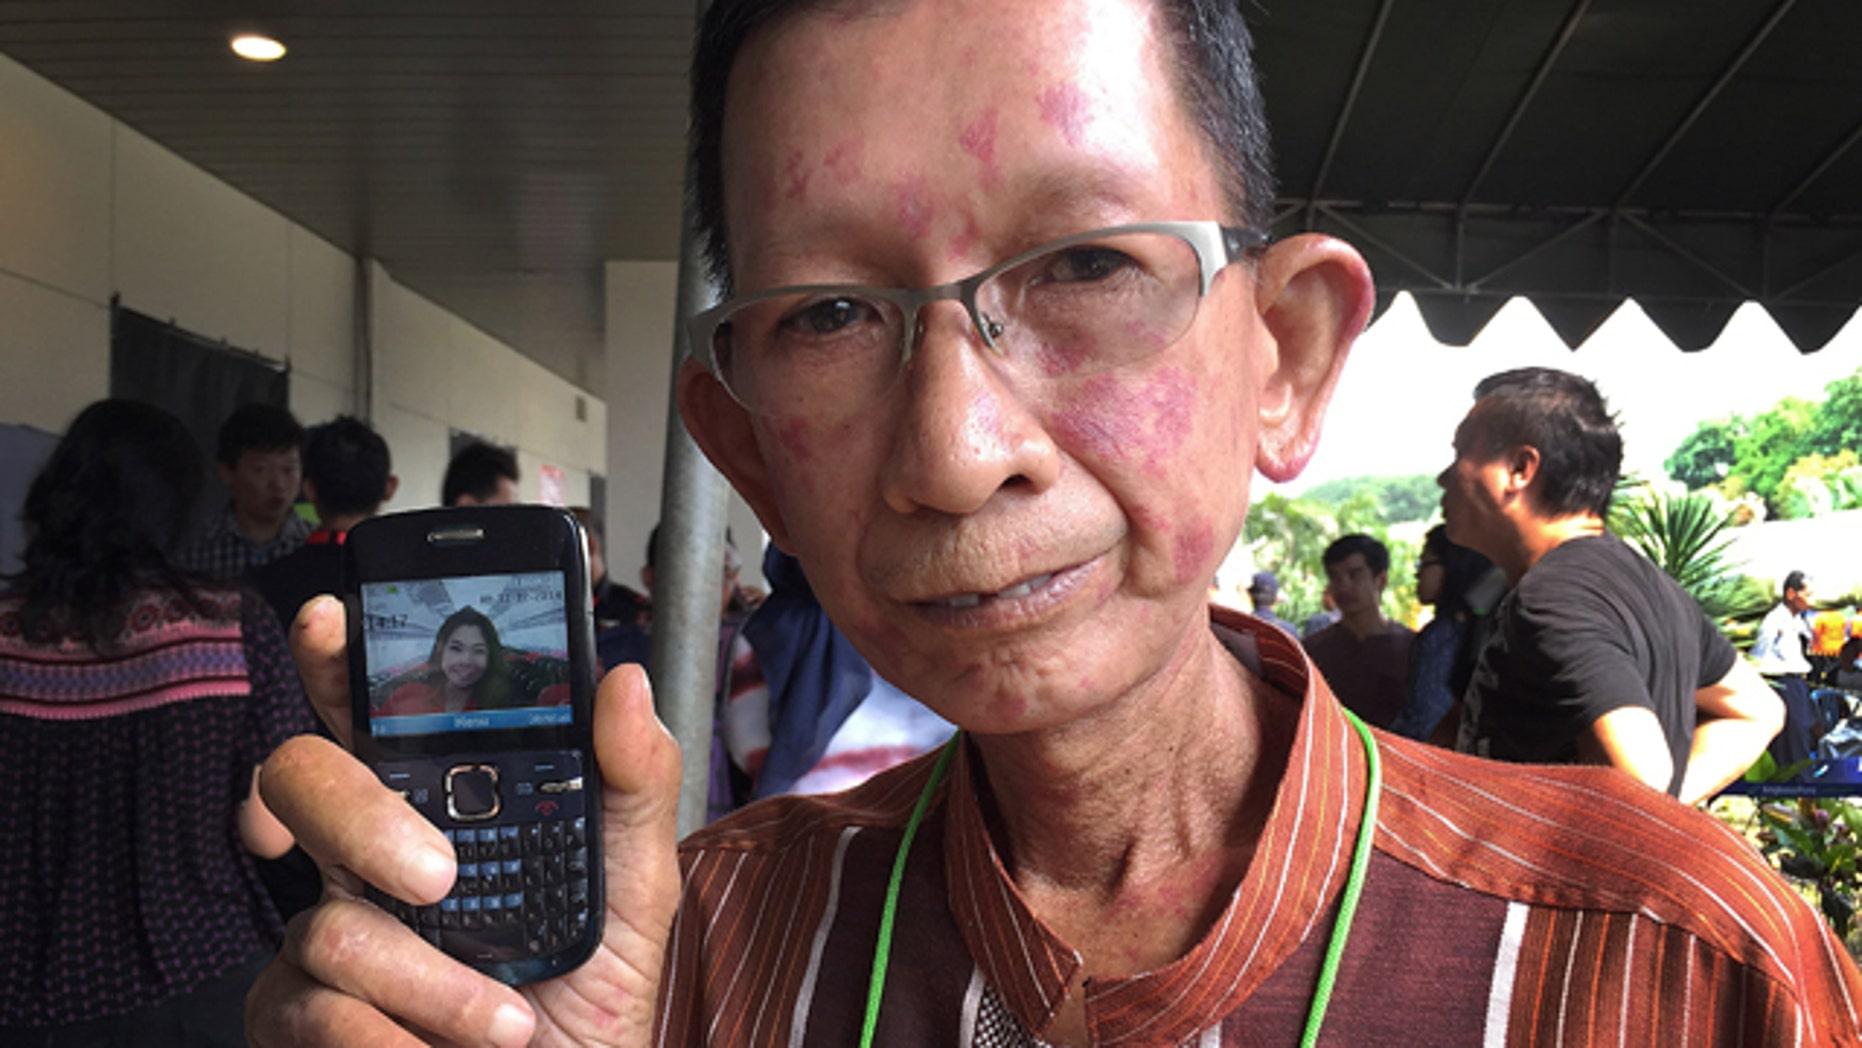 Dec. 31, 2014: Haidar Fauzie, 60, holds up a picture of his daughter Khairunnisa Haidar, 22, who was a flight attendant on AirAsia Flight 8501, at Juanda International Airport in Surabaya, Indonesia. (AP Photo/Eileen Ng)